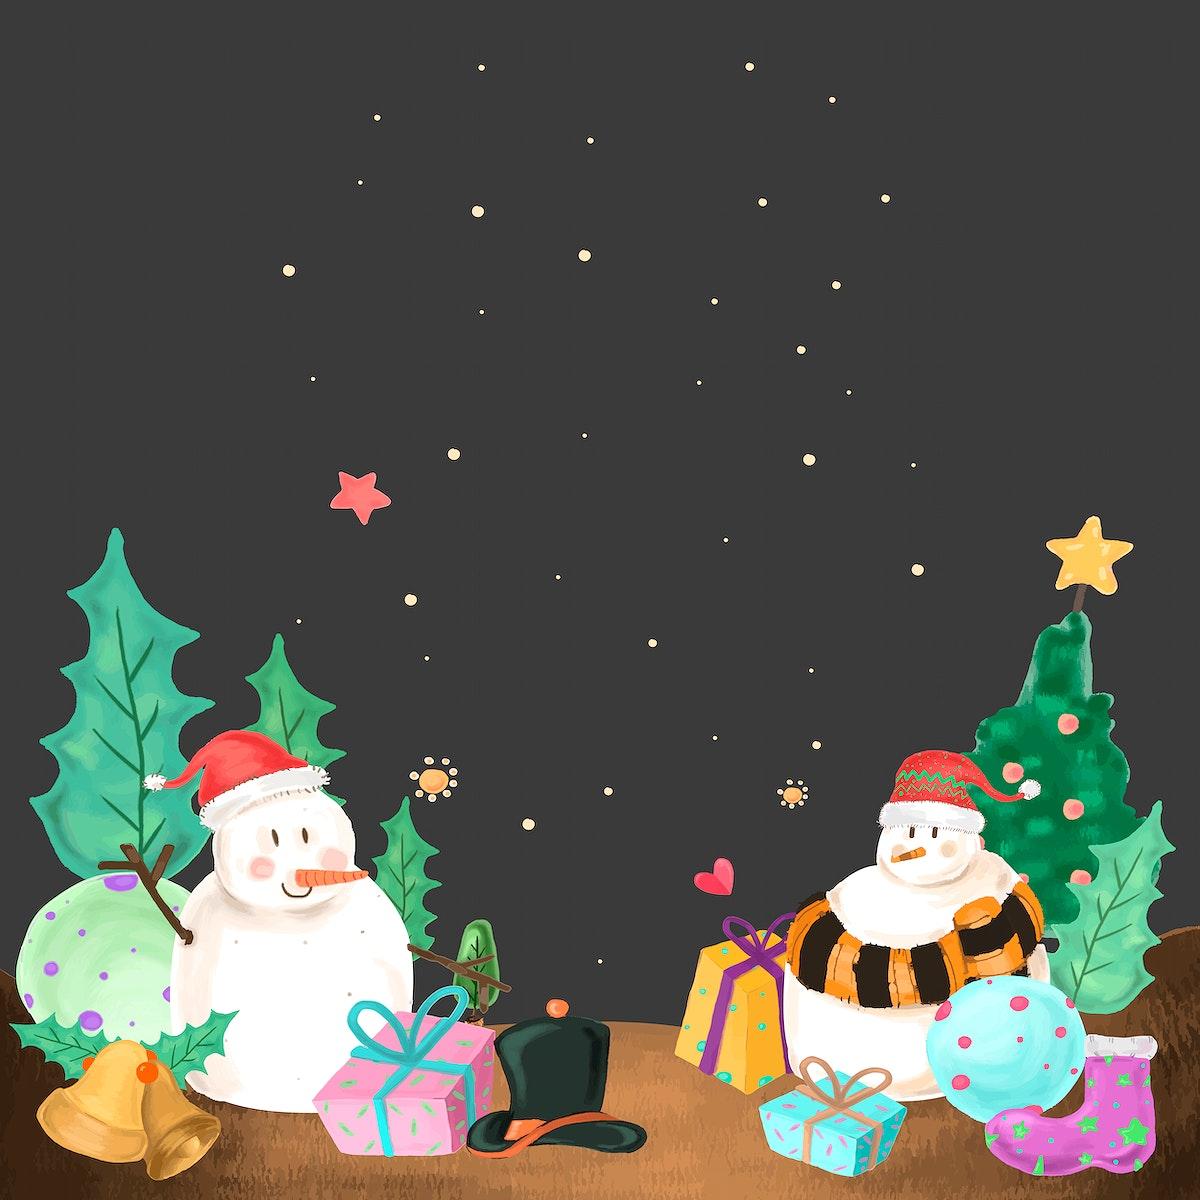 Snowman on Christmas night background vector